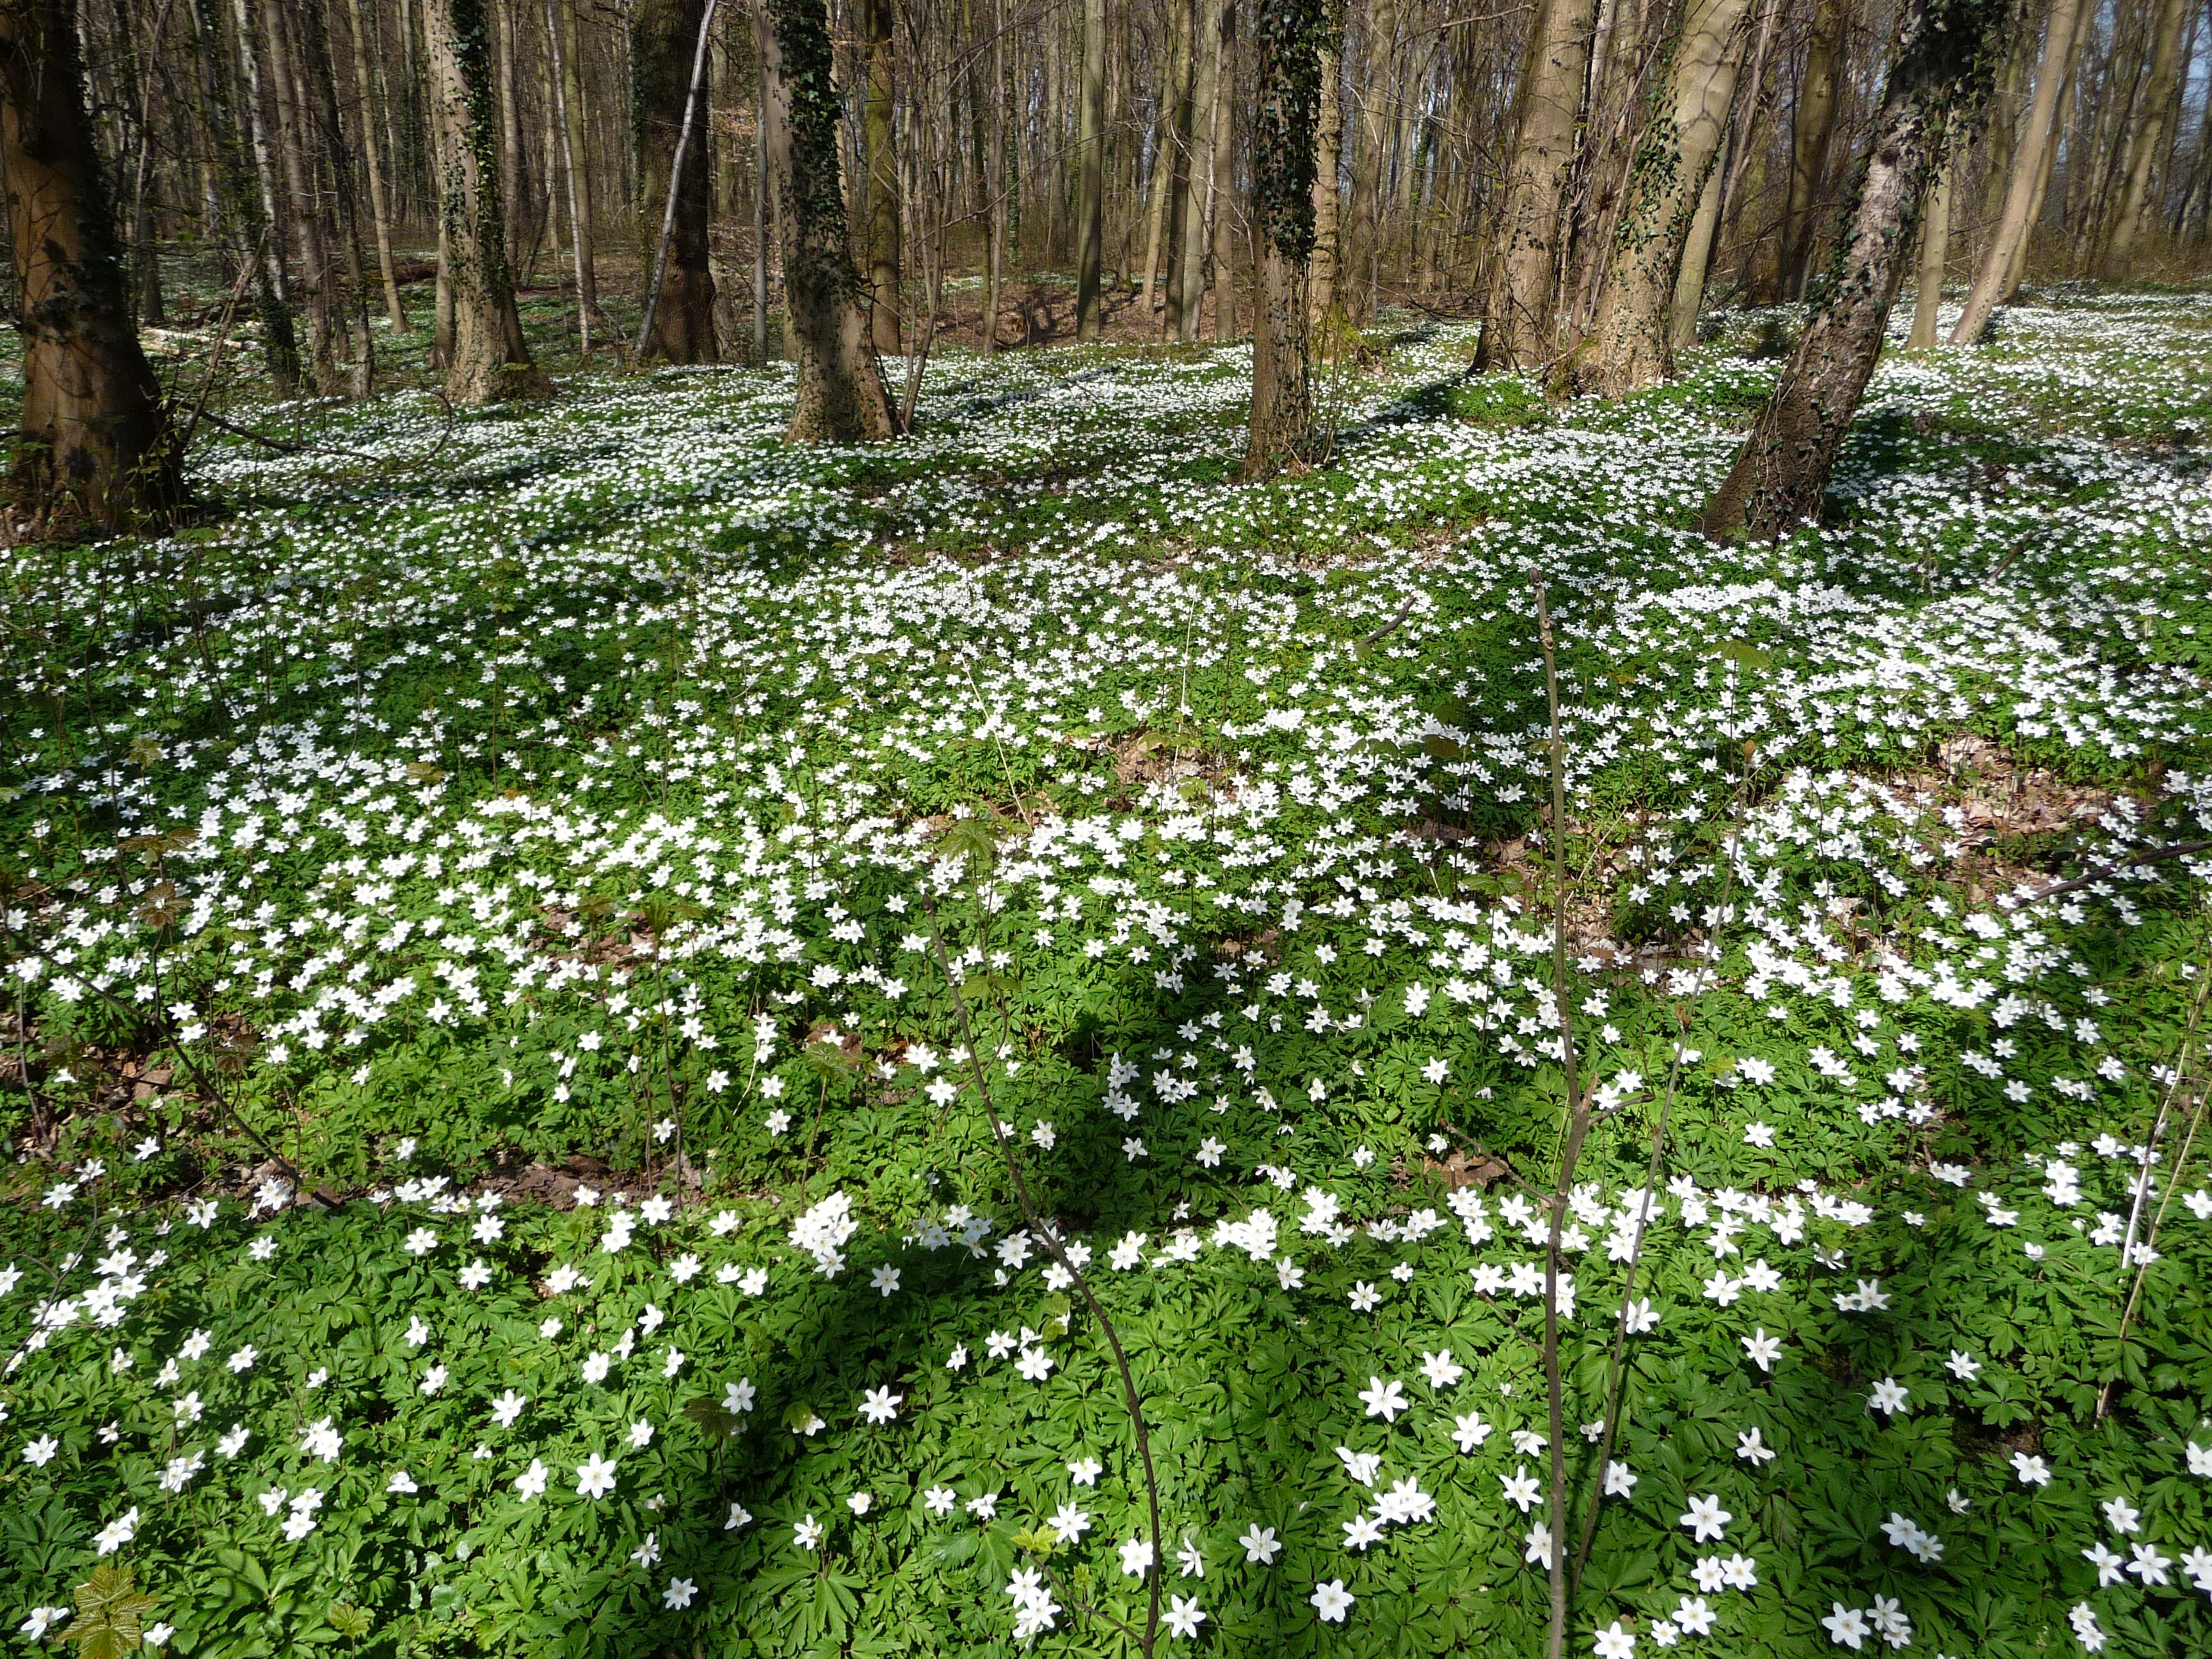 Wood anemones in the Bertembos